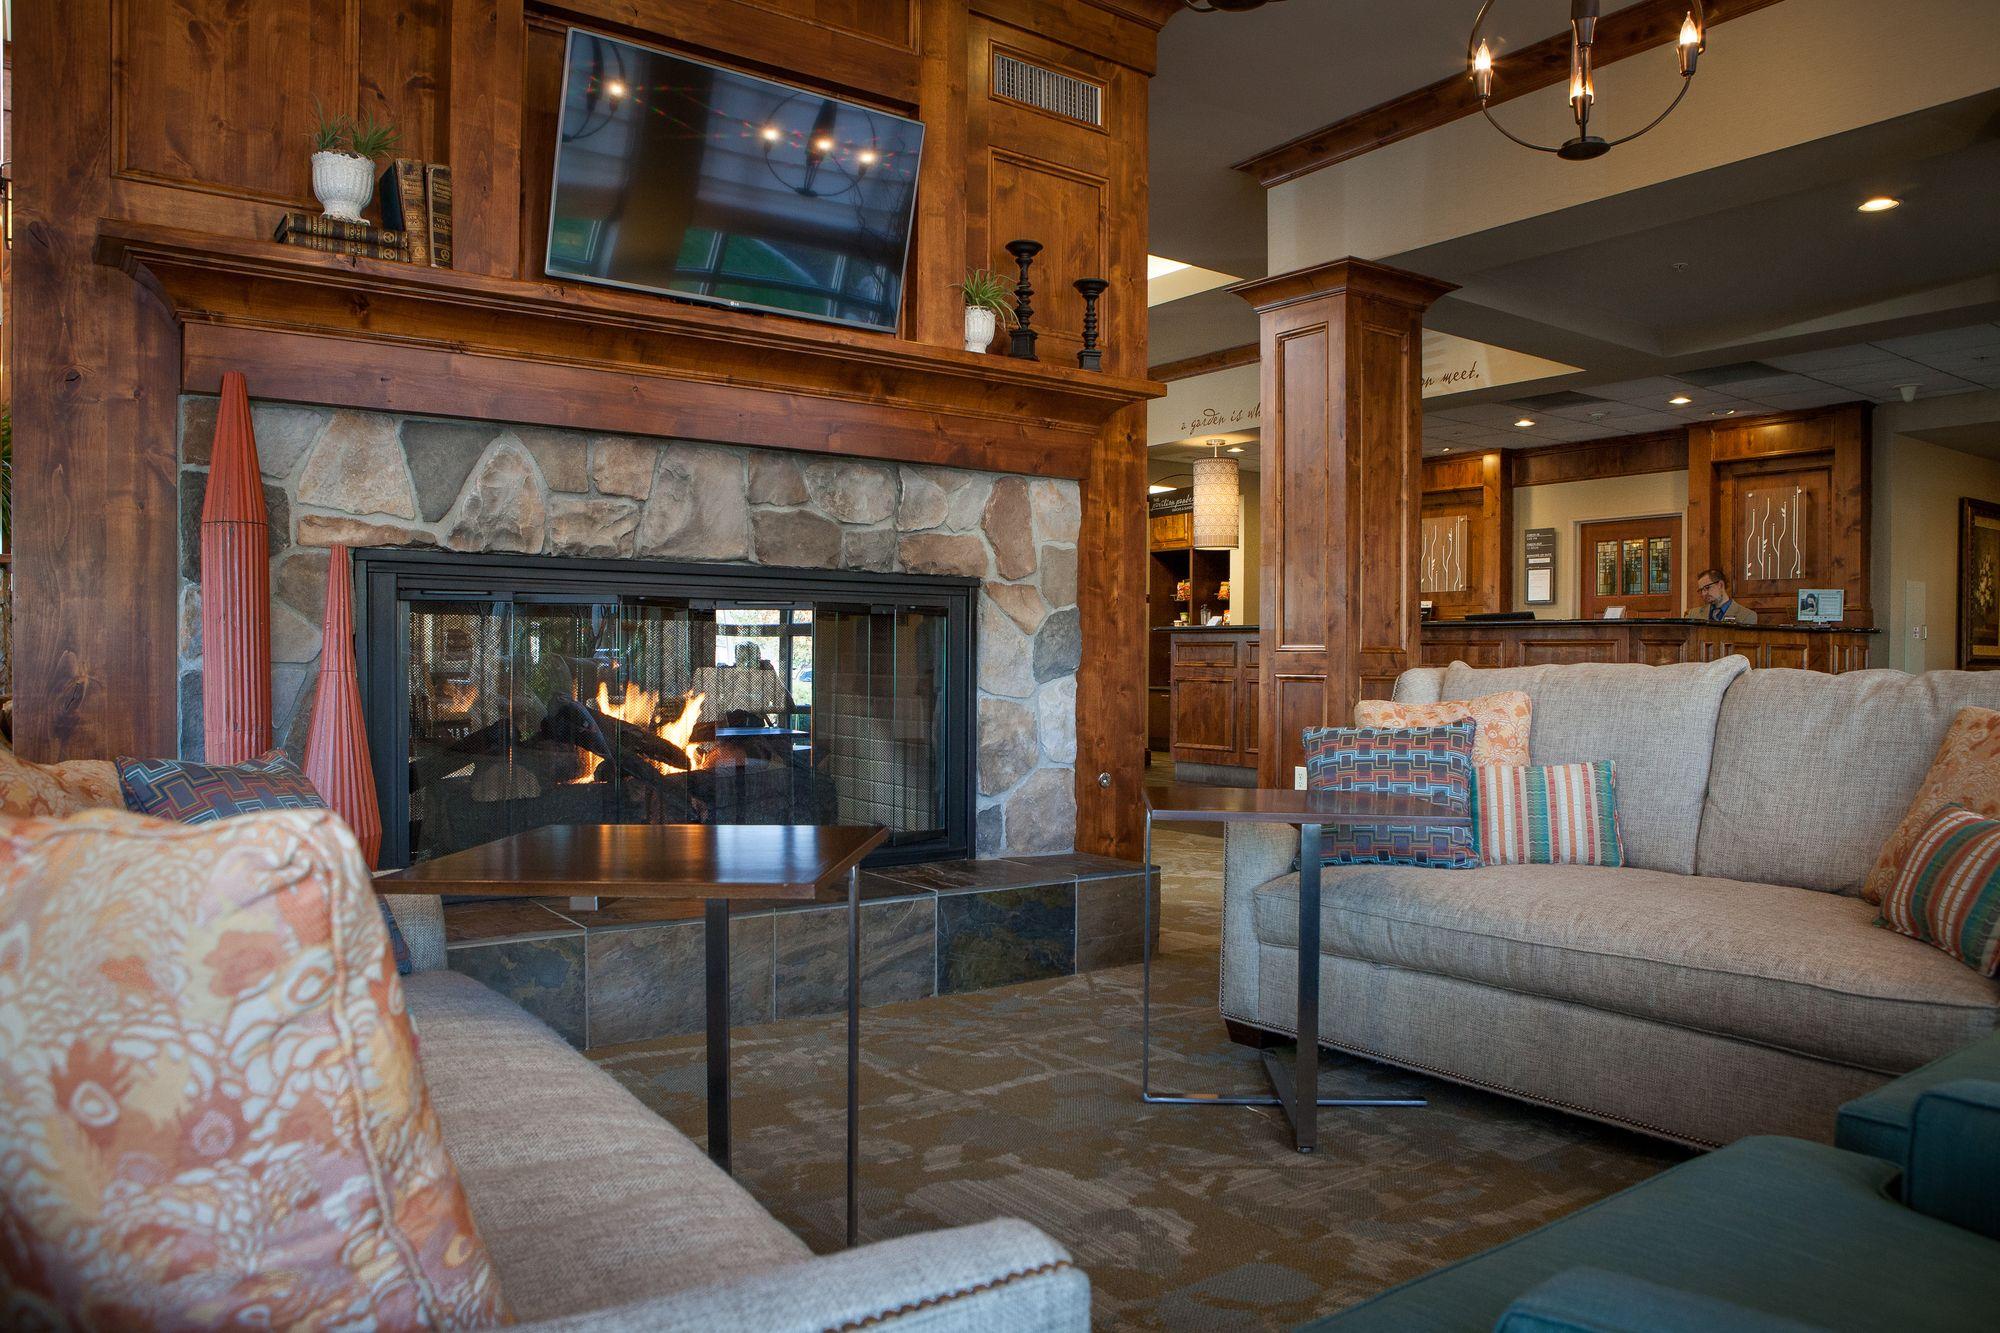 Discount Coupon for Hilton Garden Inn Boise/Eagle in Meridian, Idaho ...